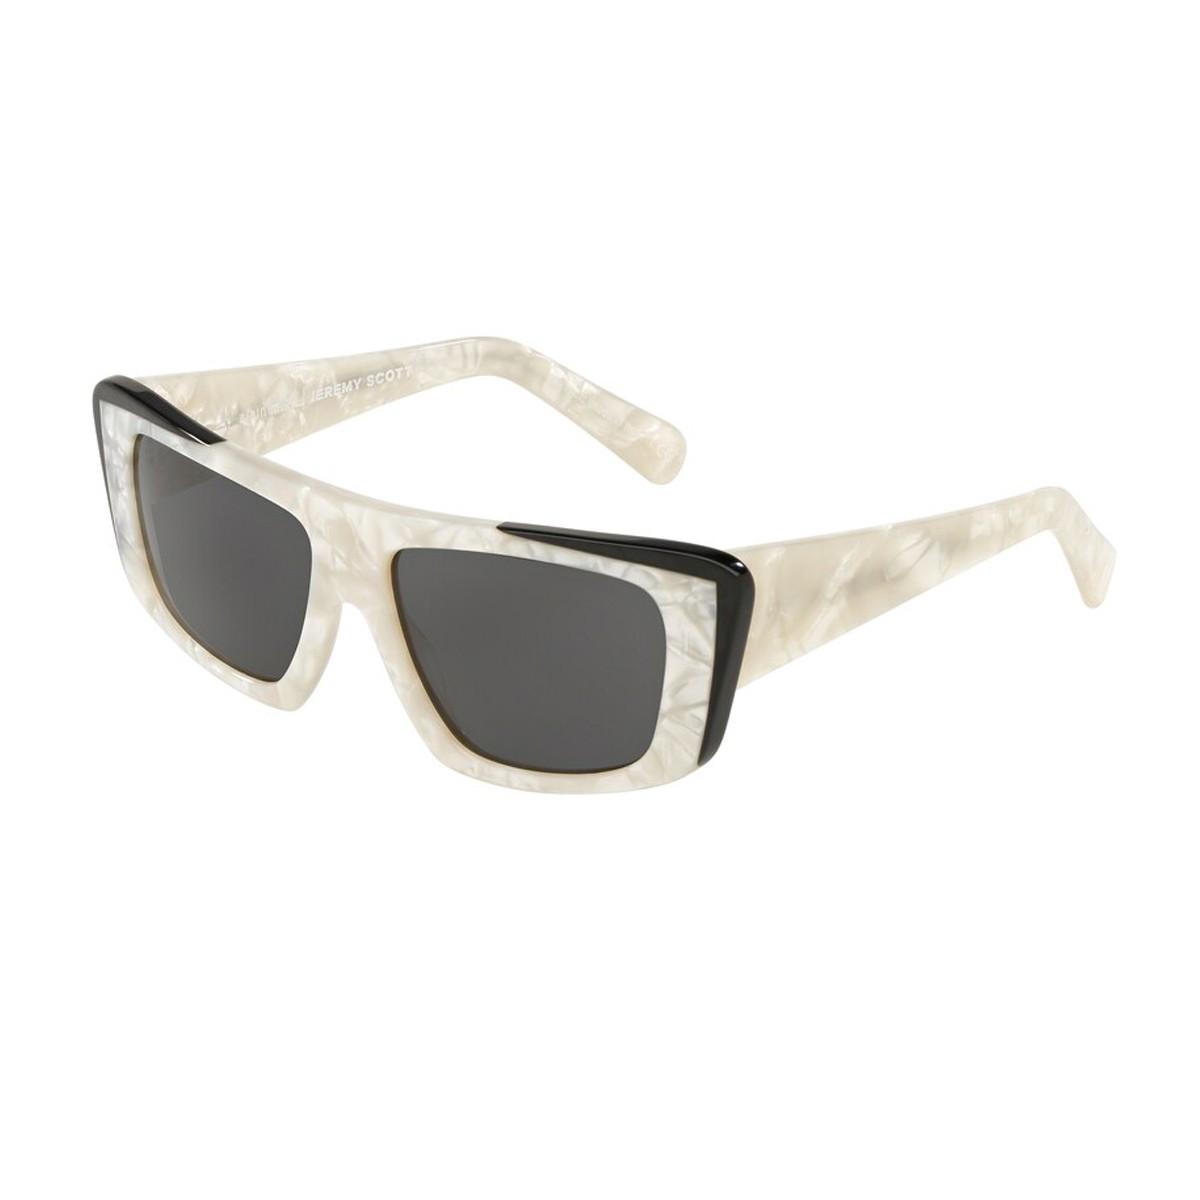 Alain Mikli A05029 Special Edition | Unisex sunglasses